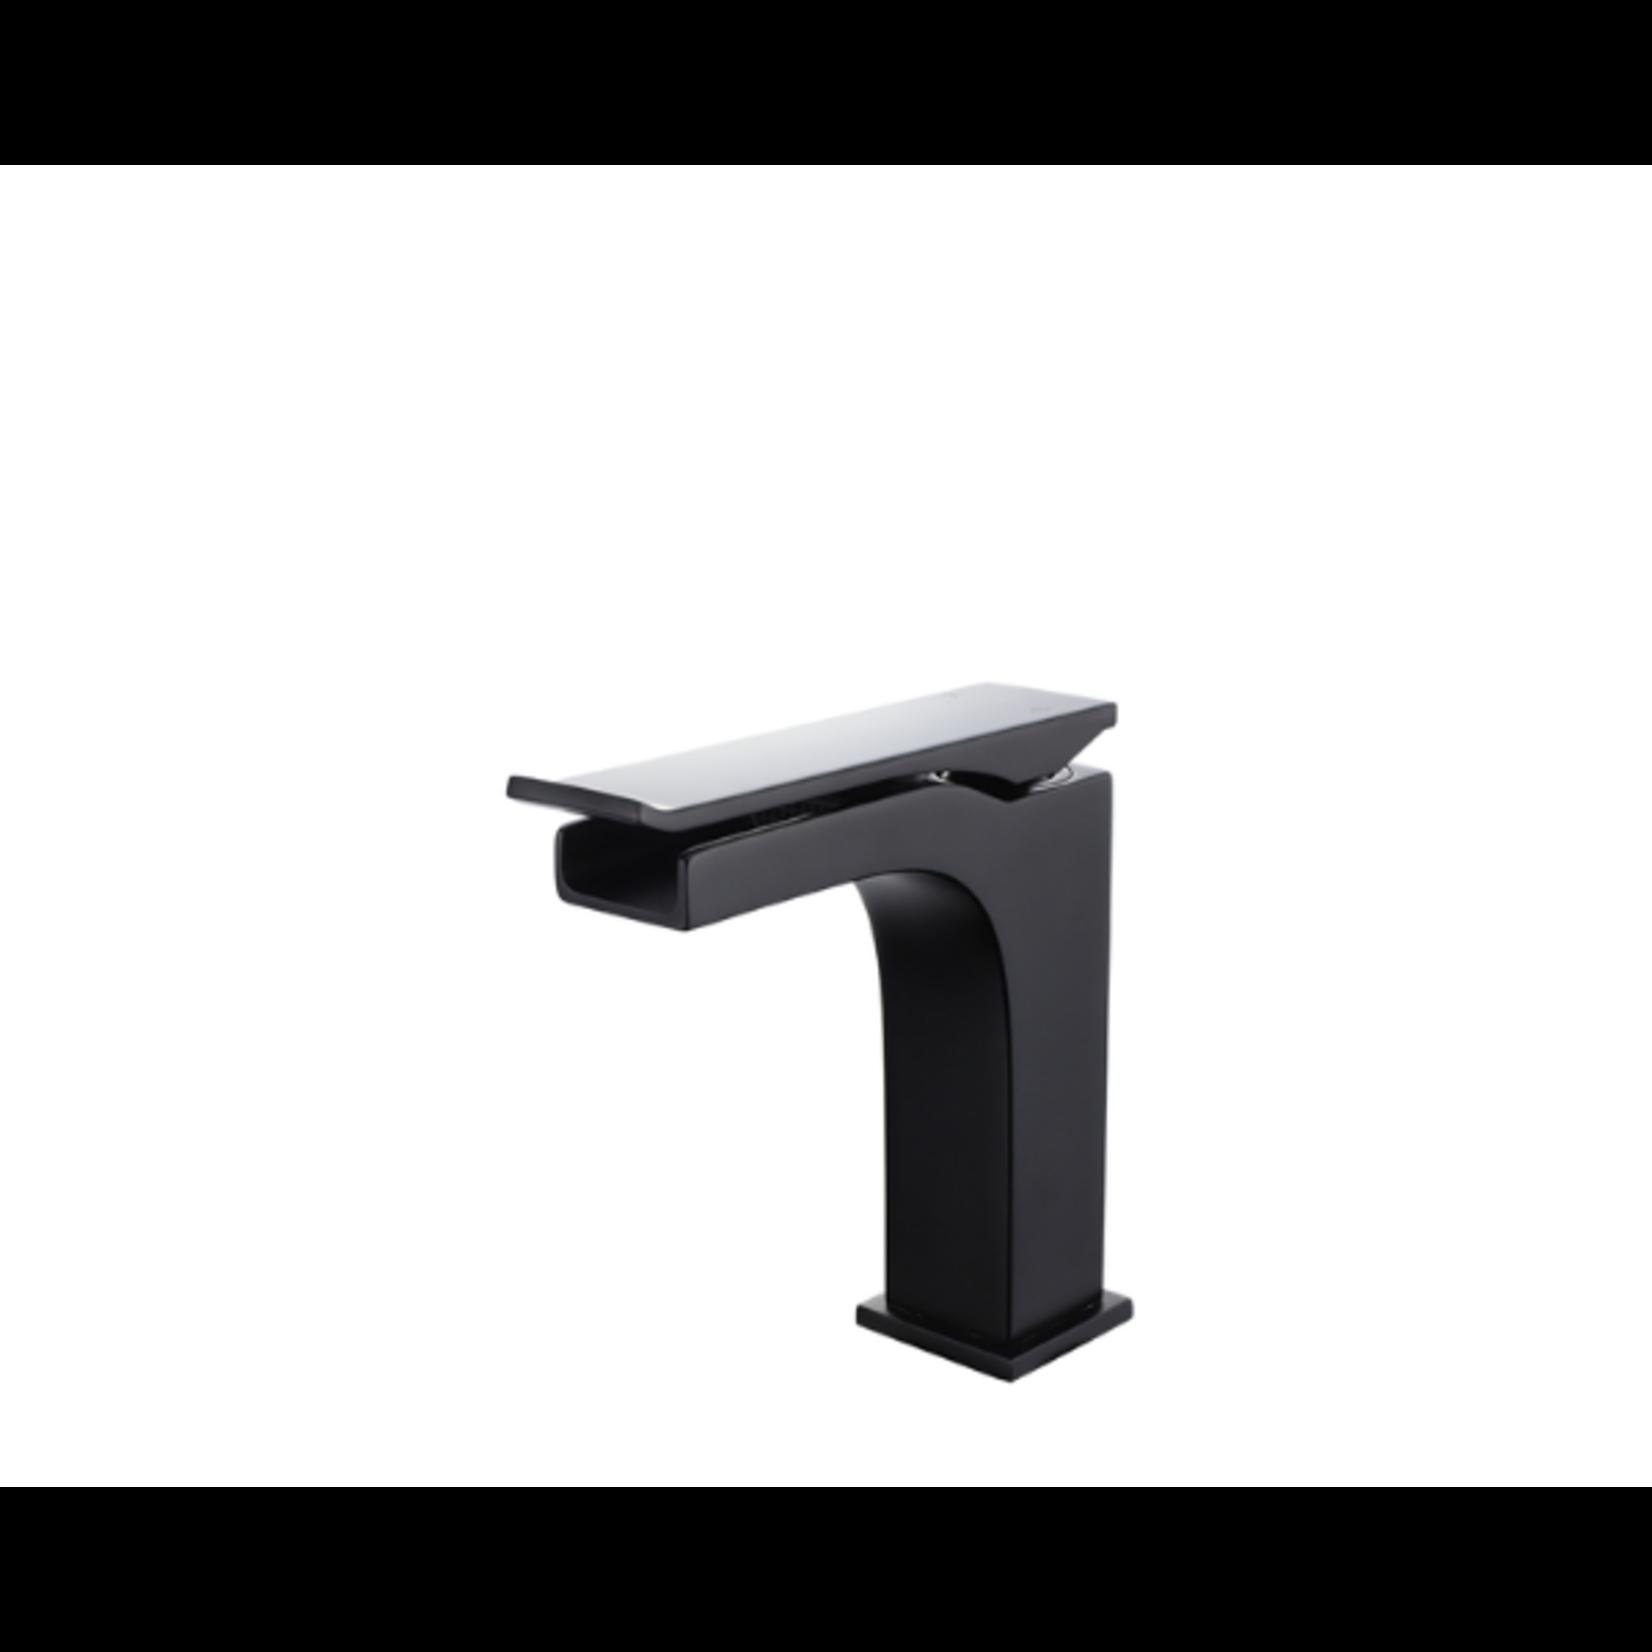 Matte black lavatory faucet NRD-981001-MB